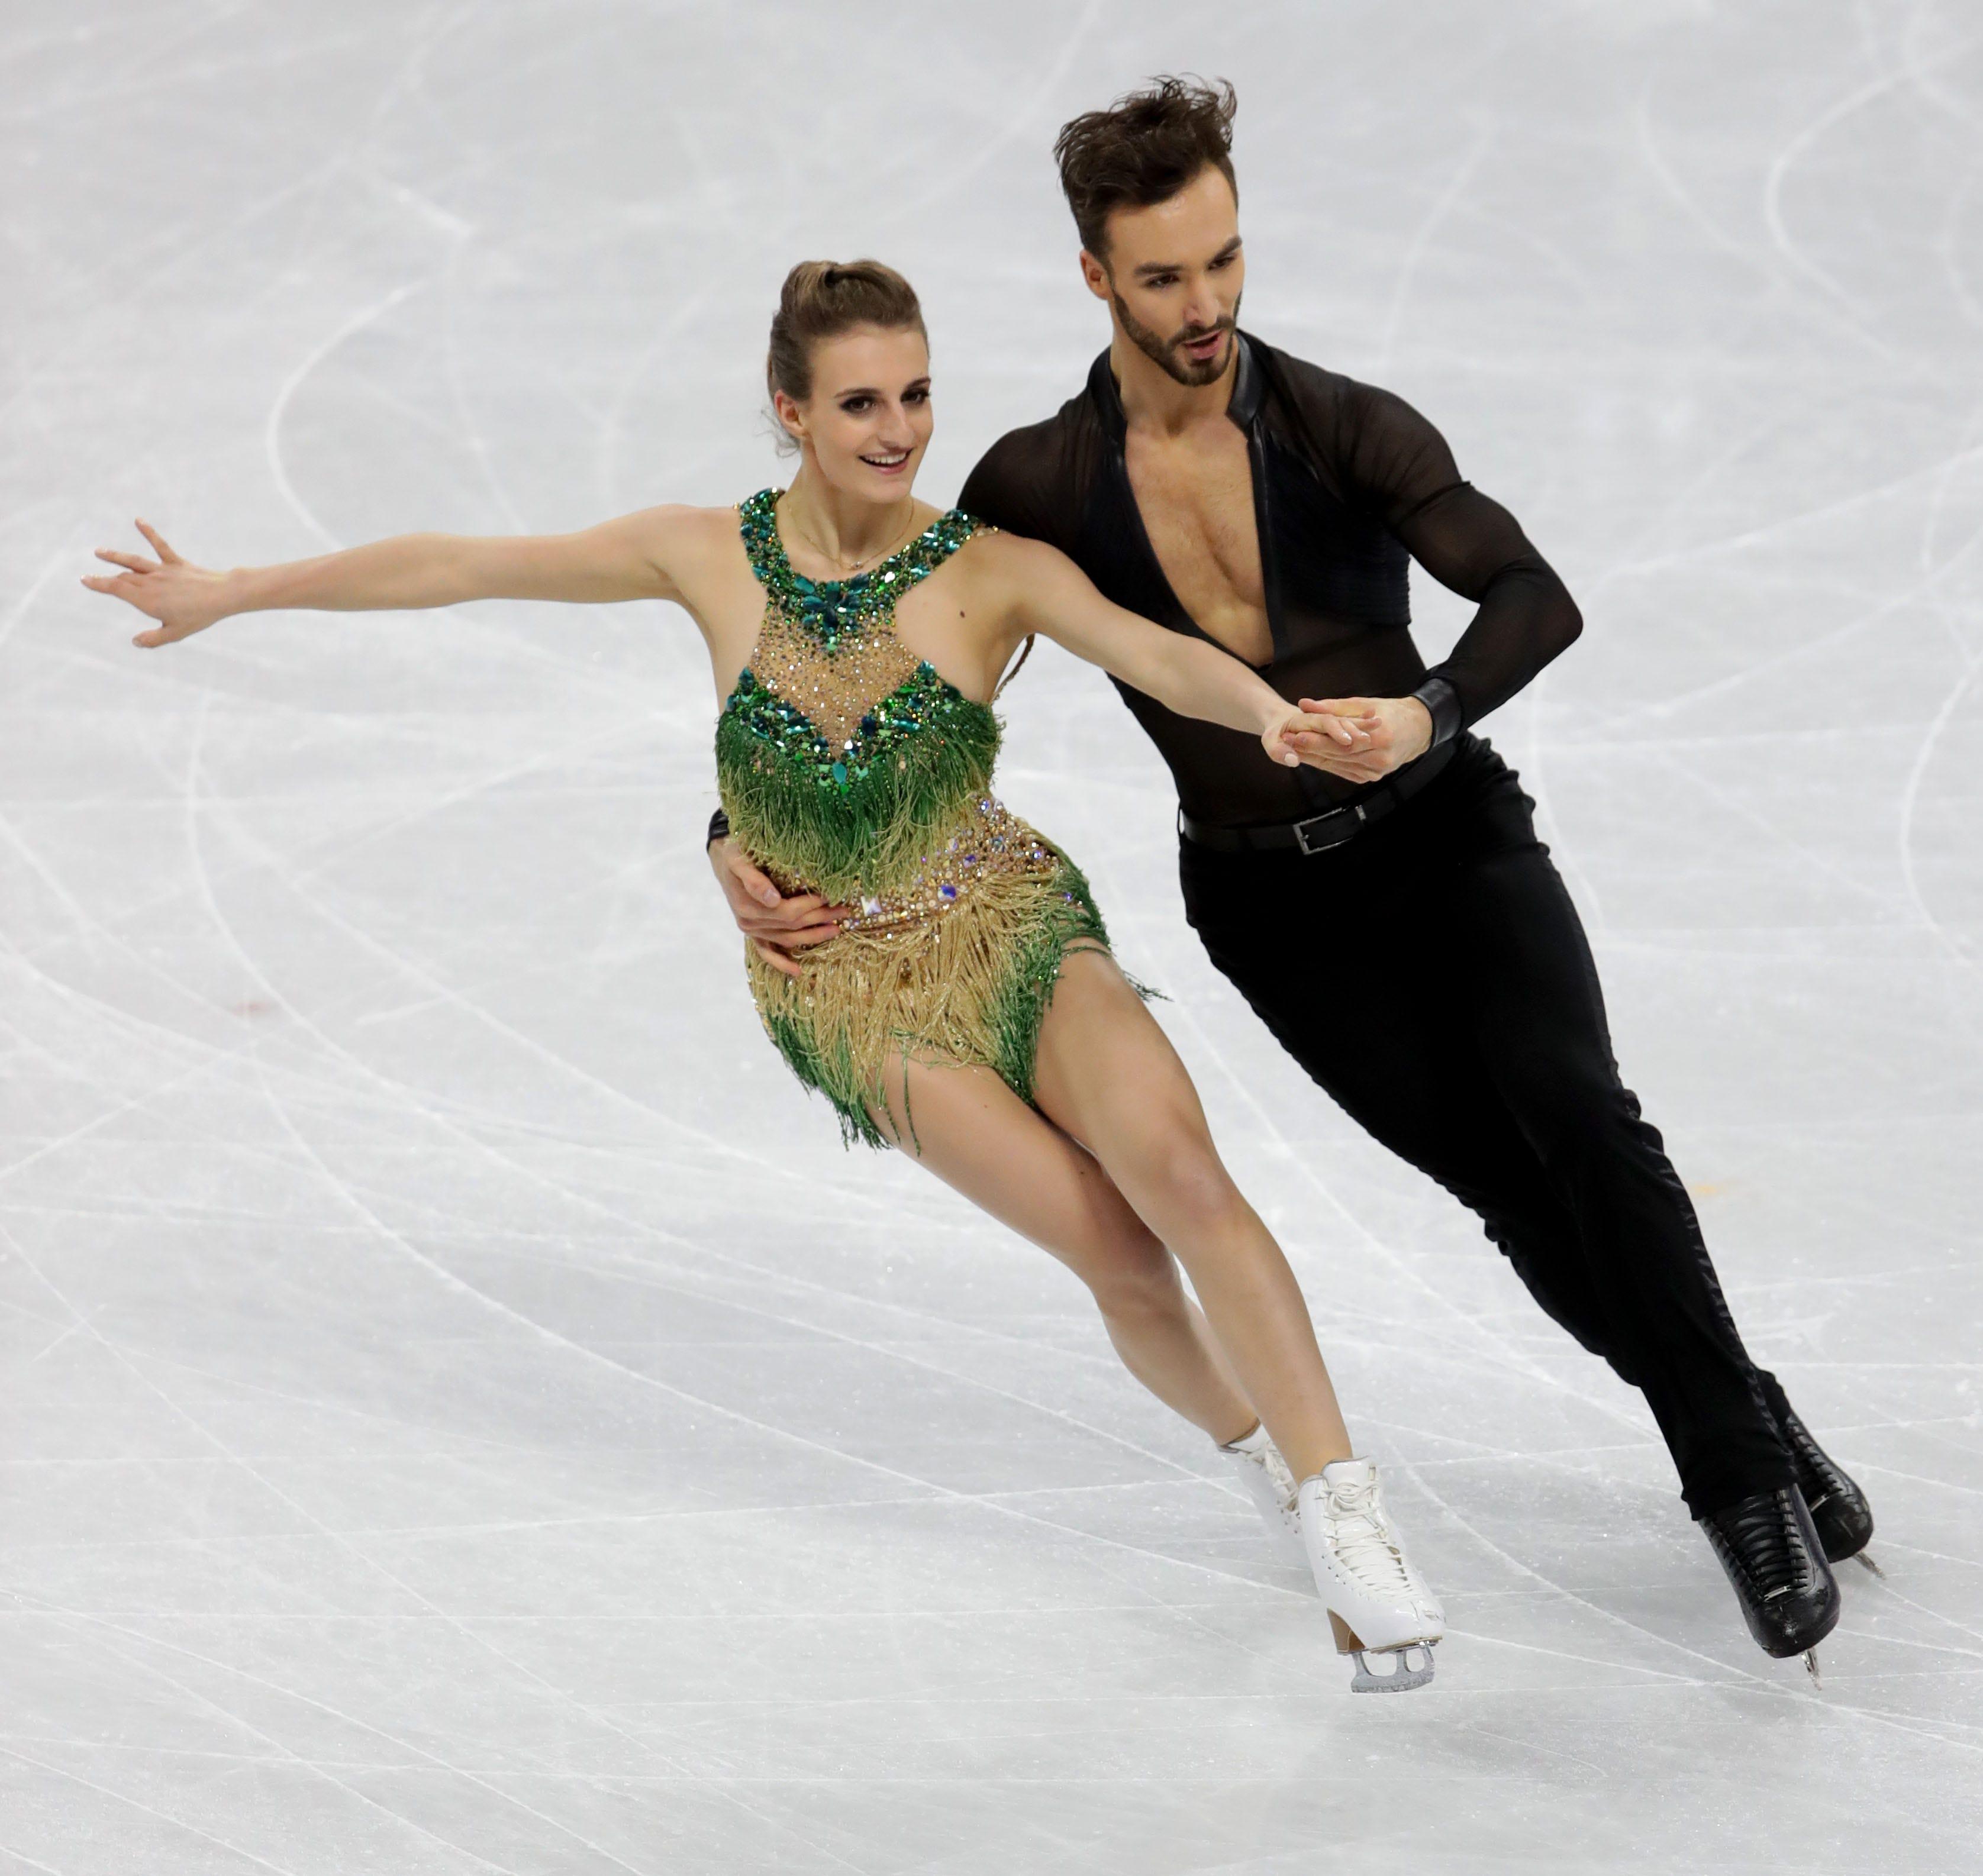 french-ice-dancer-gabriella-papadakis-devastated-after-embarrassing-wardrobe-malfunction